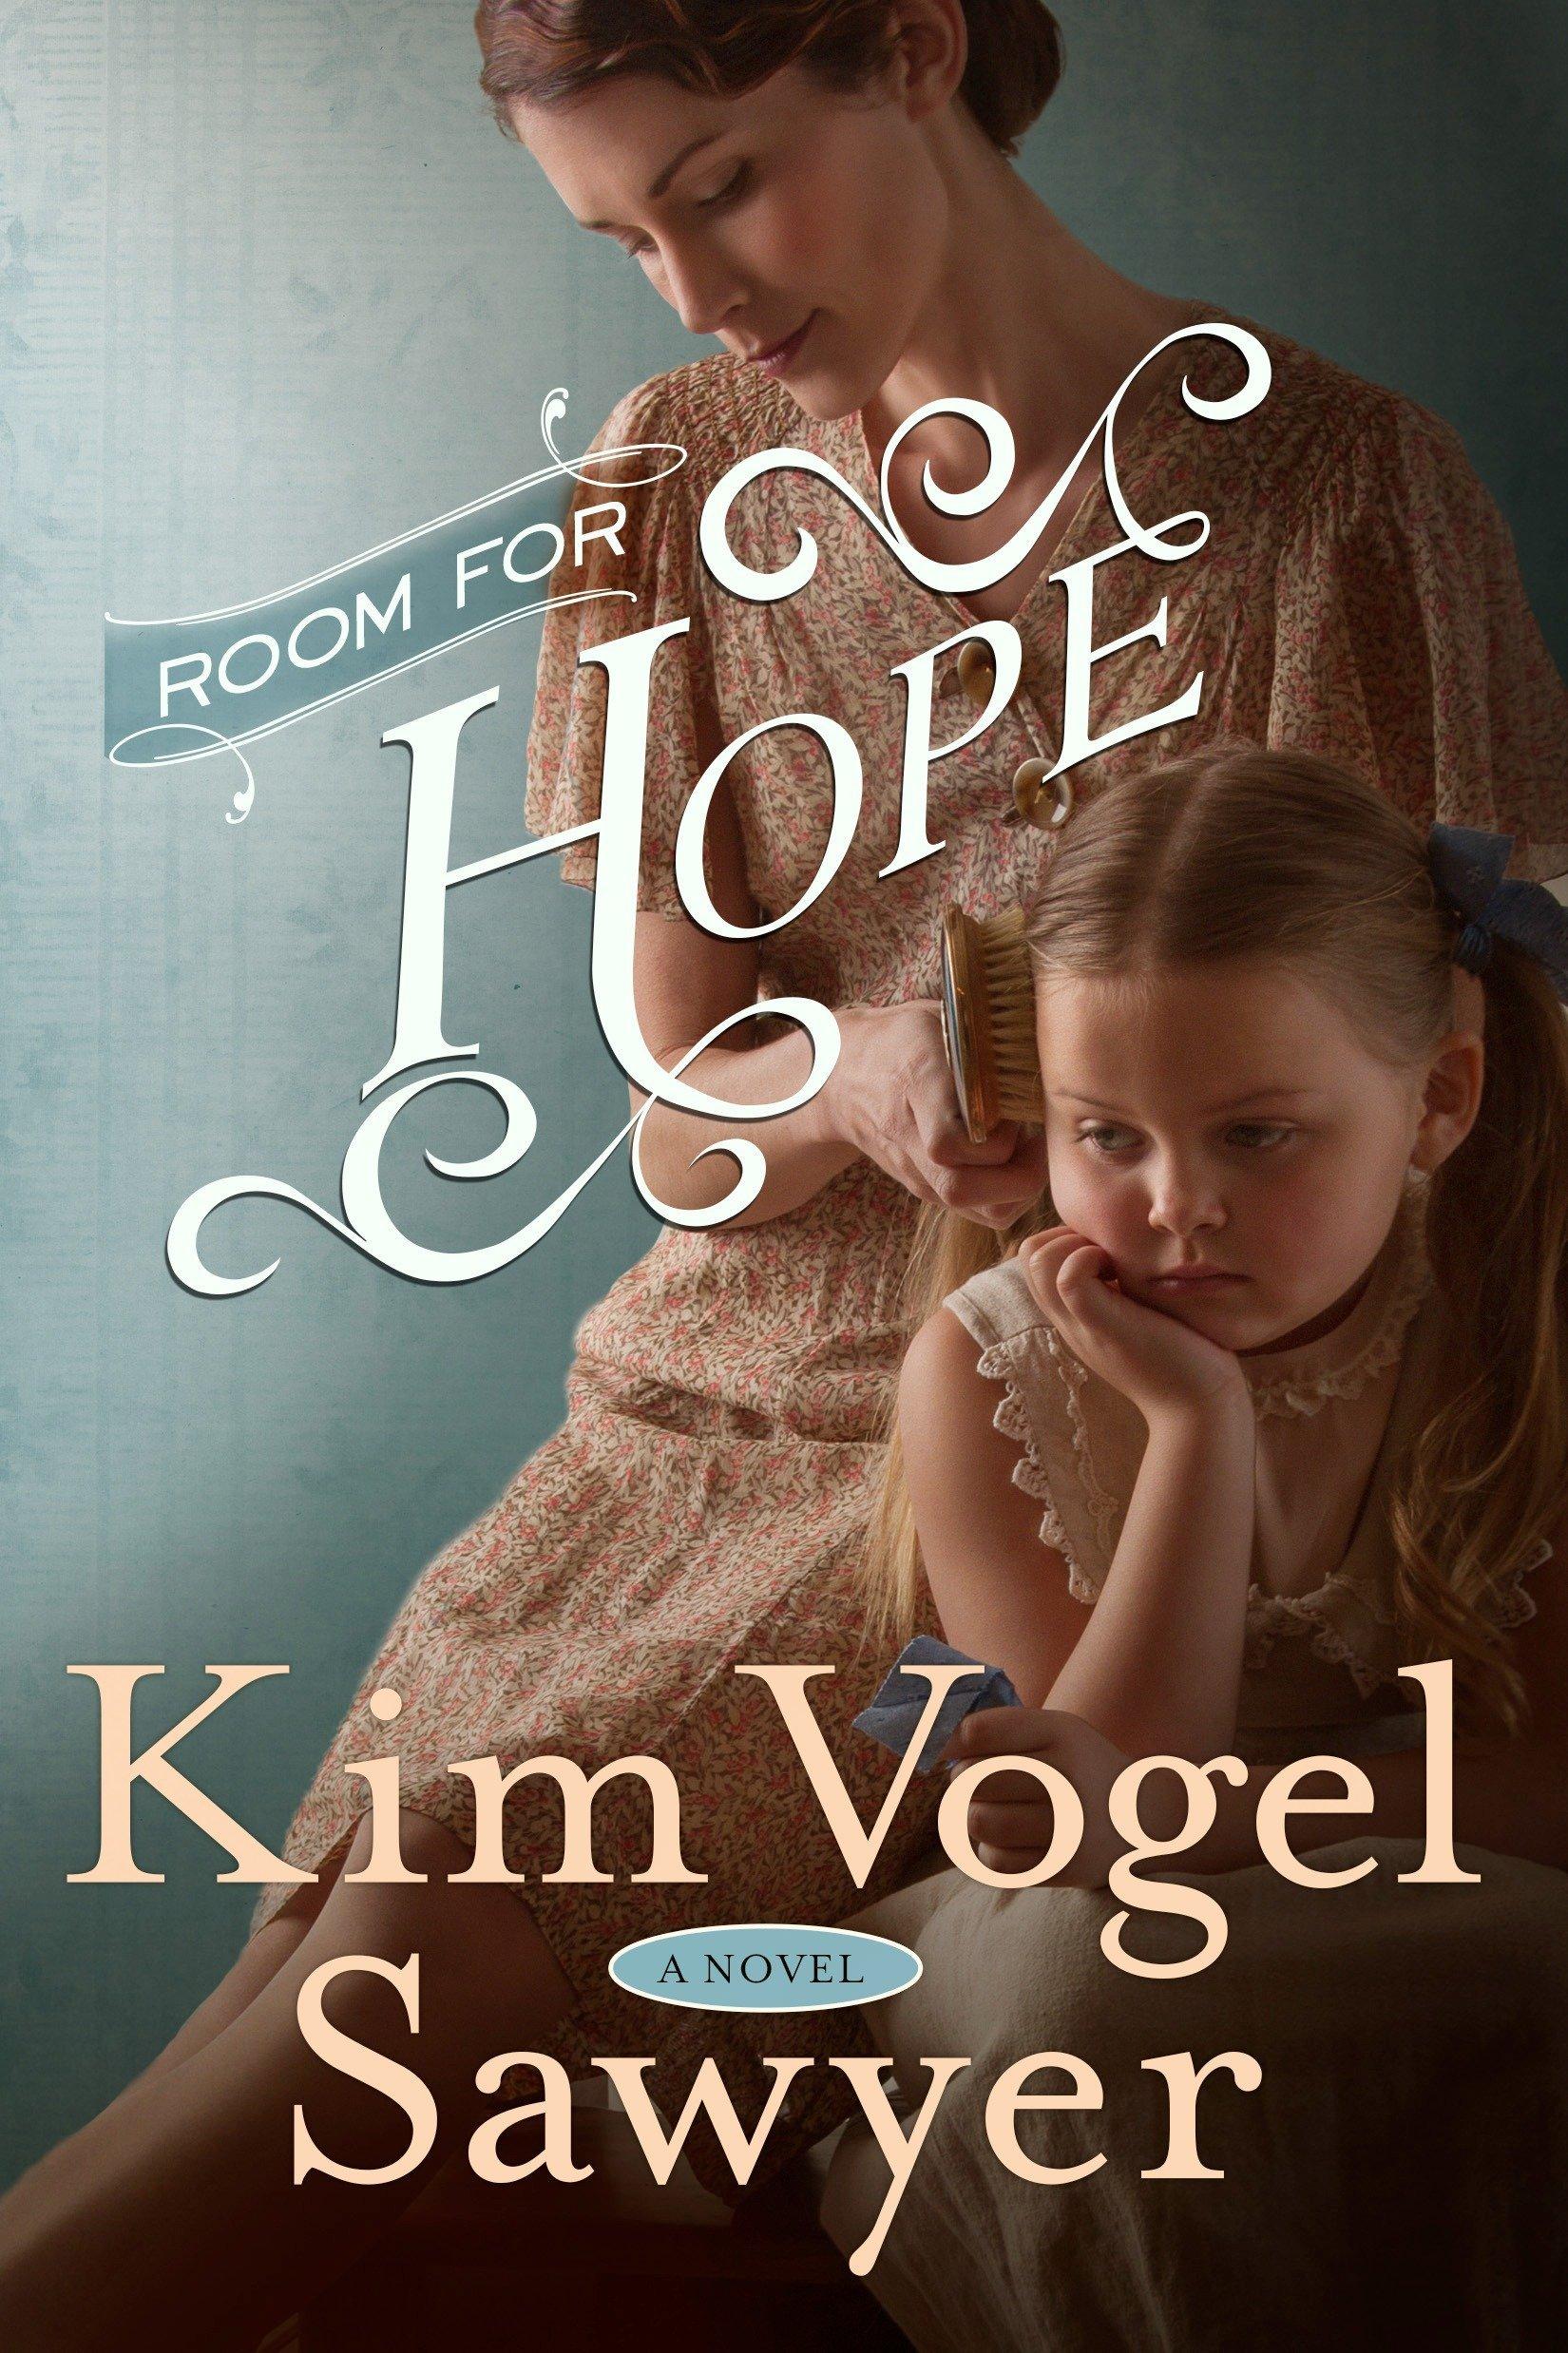 Room for Hope: A Novel: Kim Vogel Sawyer: 9780307731371: Amazon.com: Books